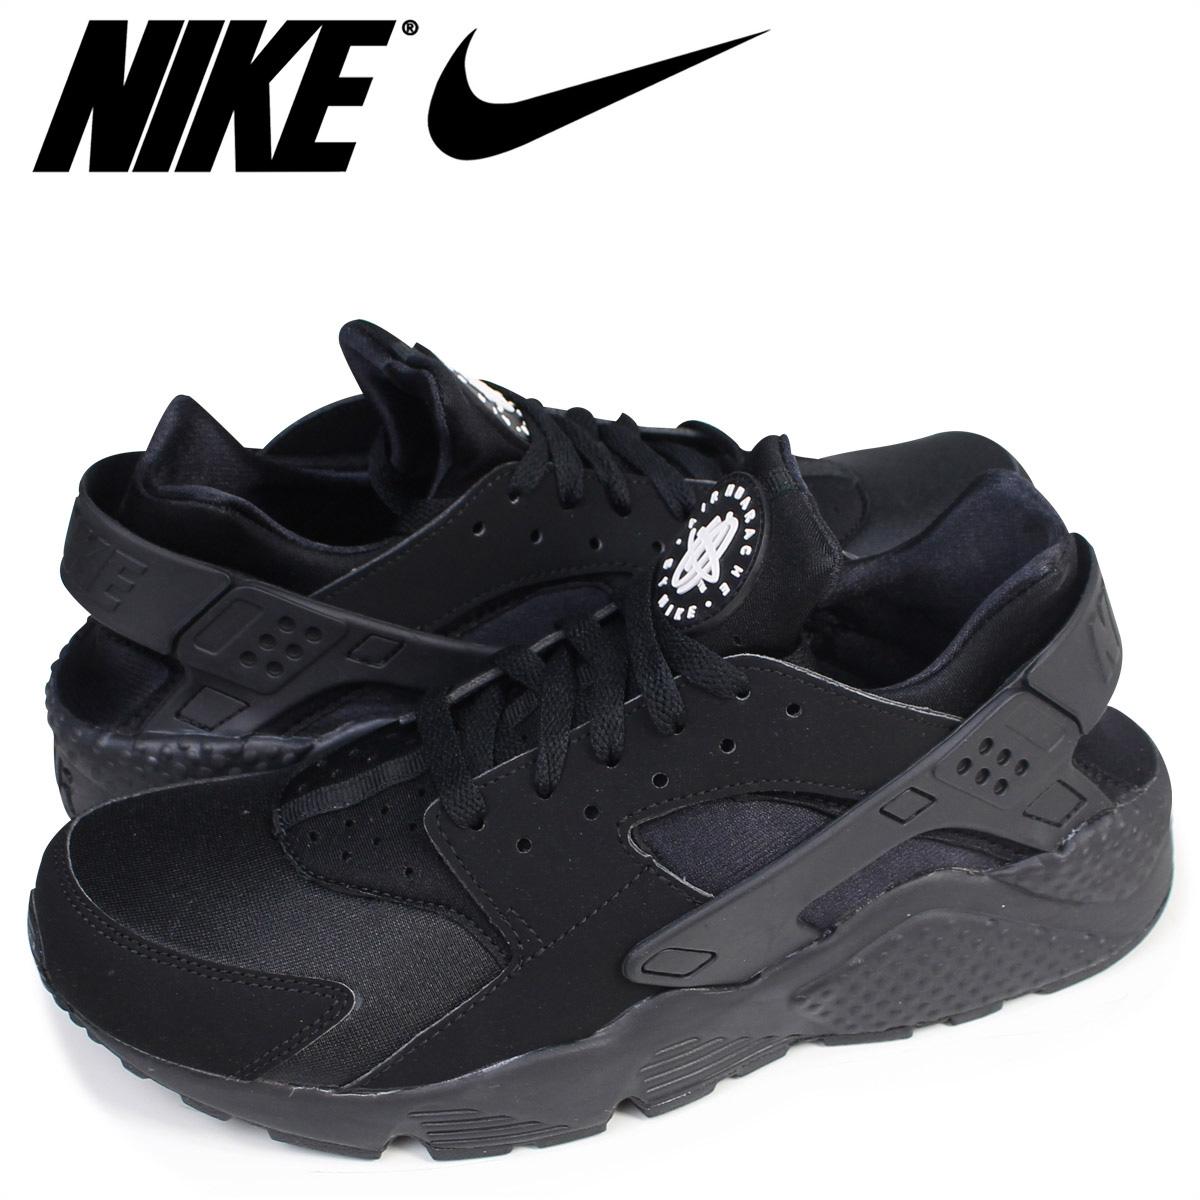 half off 73647 dc456 Nike NIKE エアハラチスニーカー AIR HUARACHE 318,429-003 men s shoes black  7 8  Shinnyu load